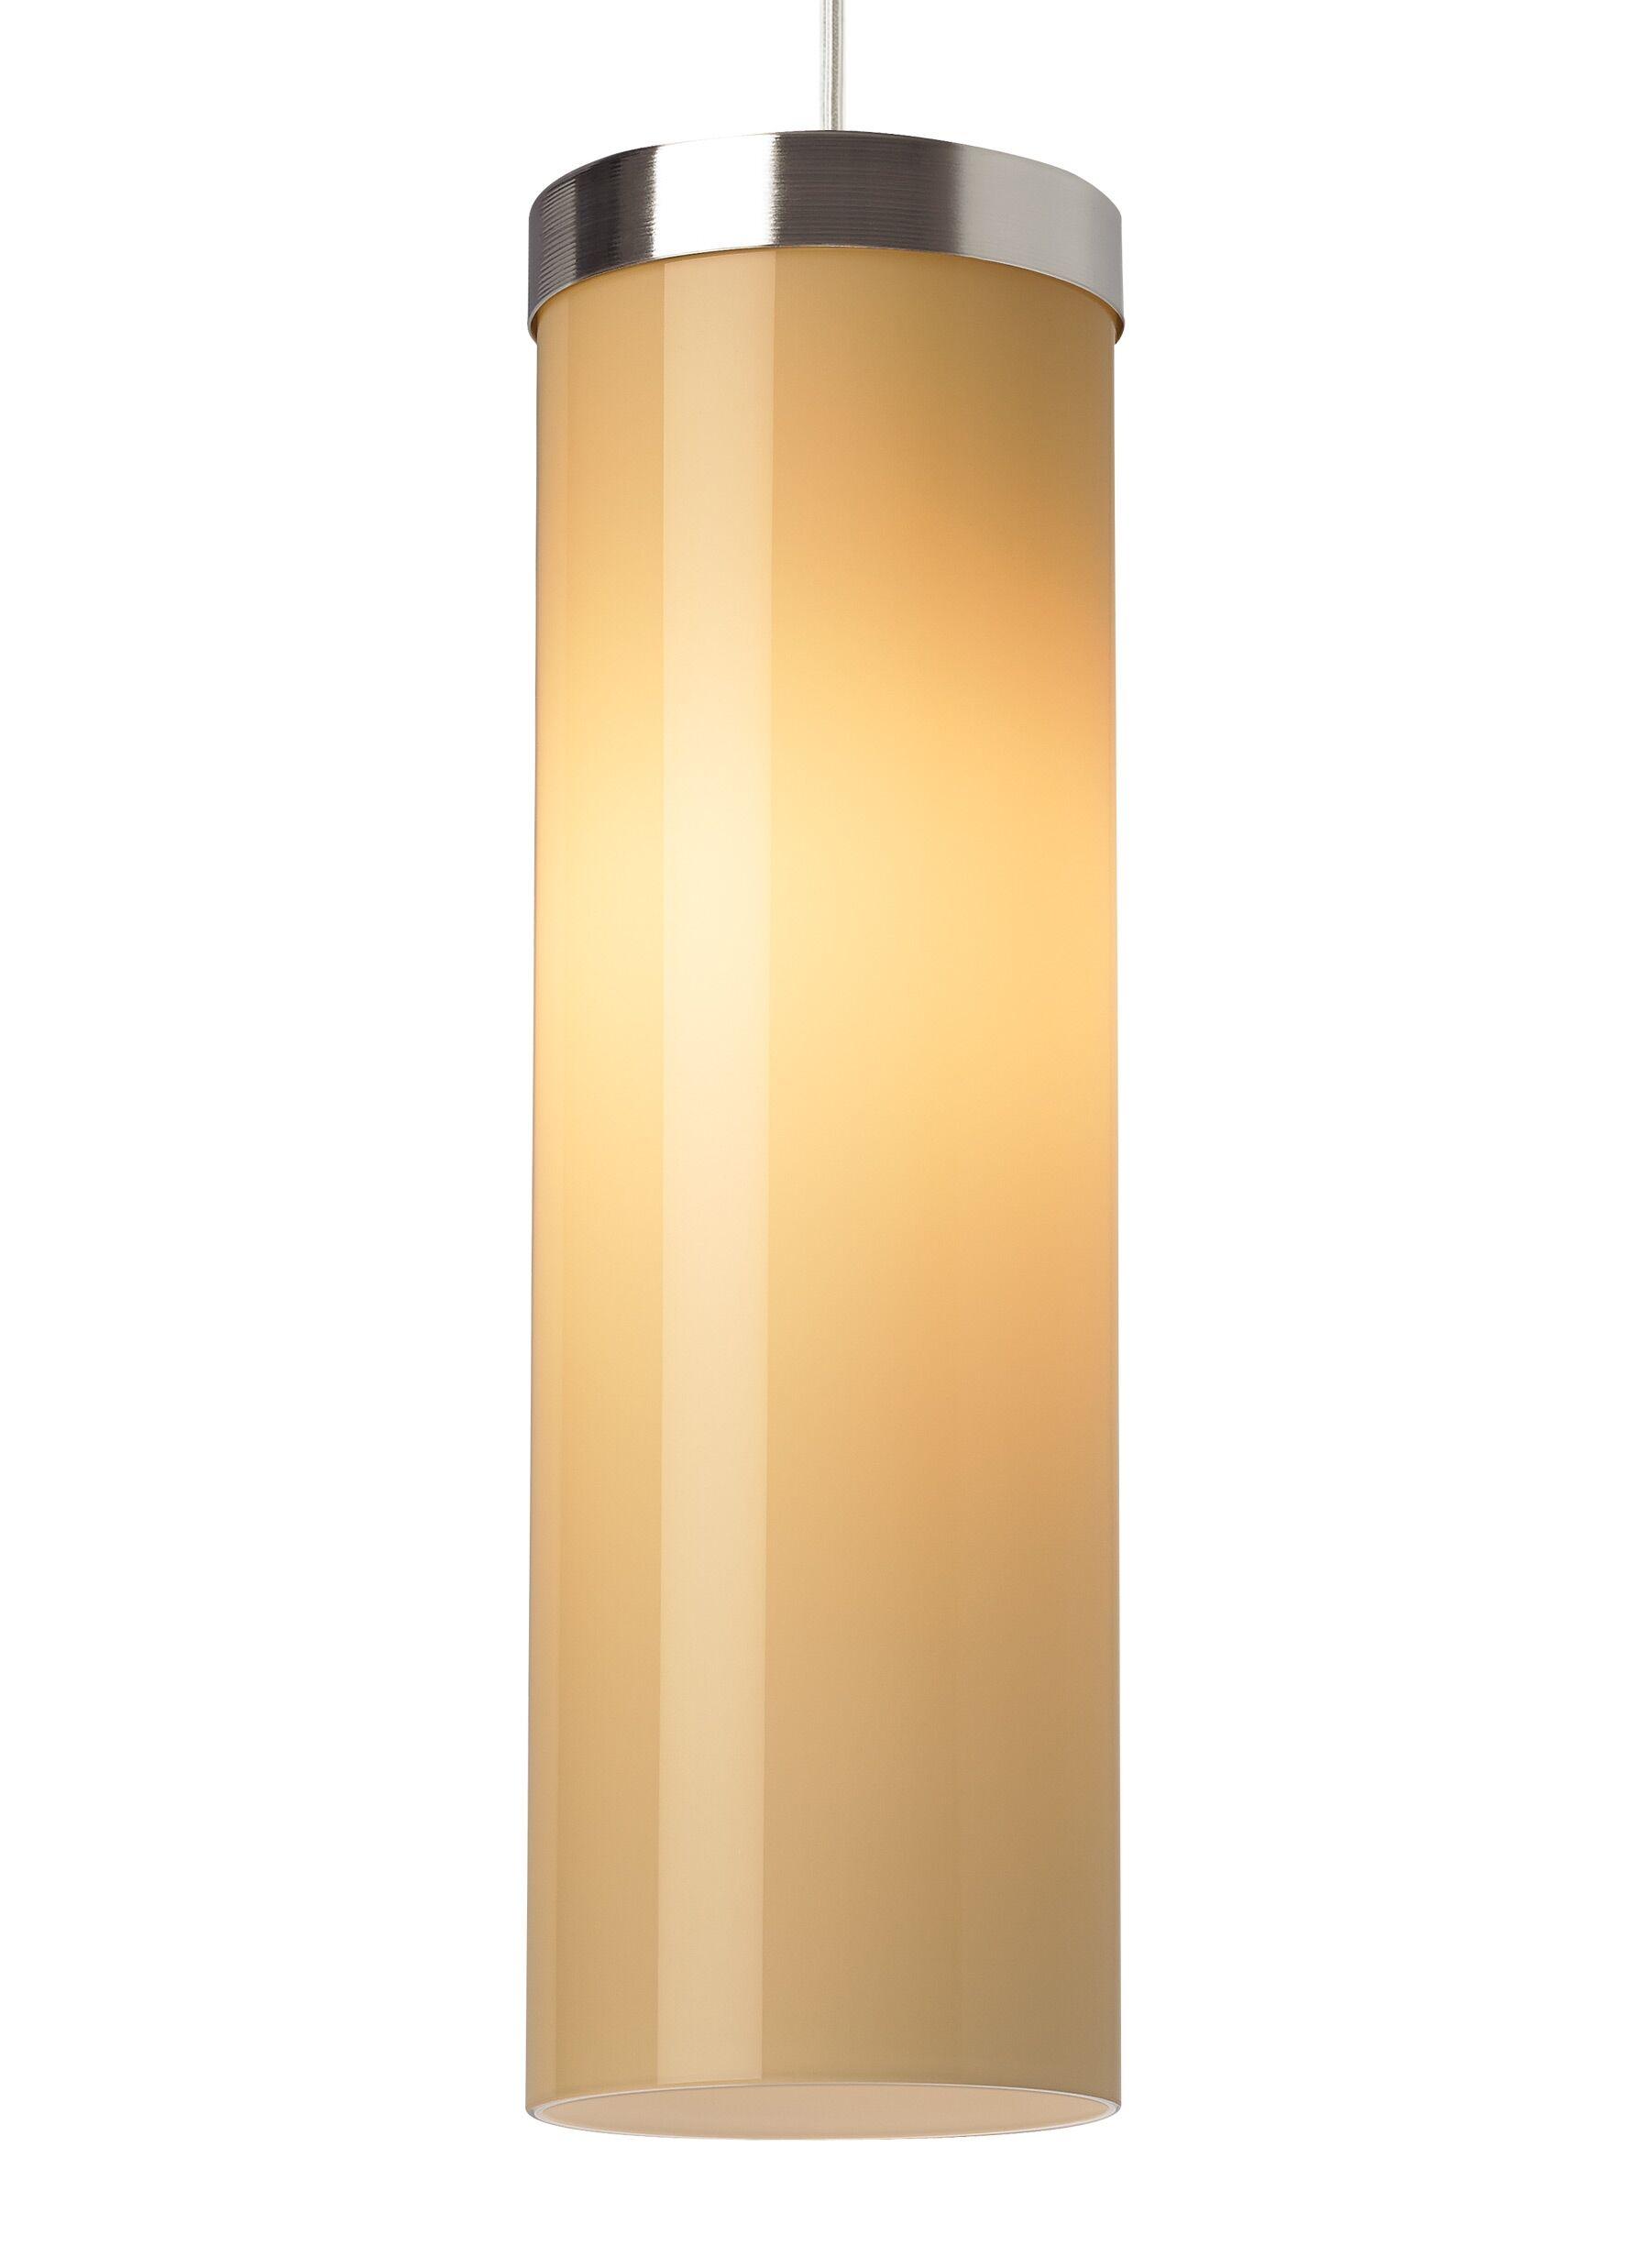 Hudson 1-Light Cylinder Pendant Shade Color: Latte, Finish: White